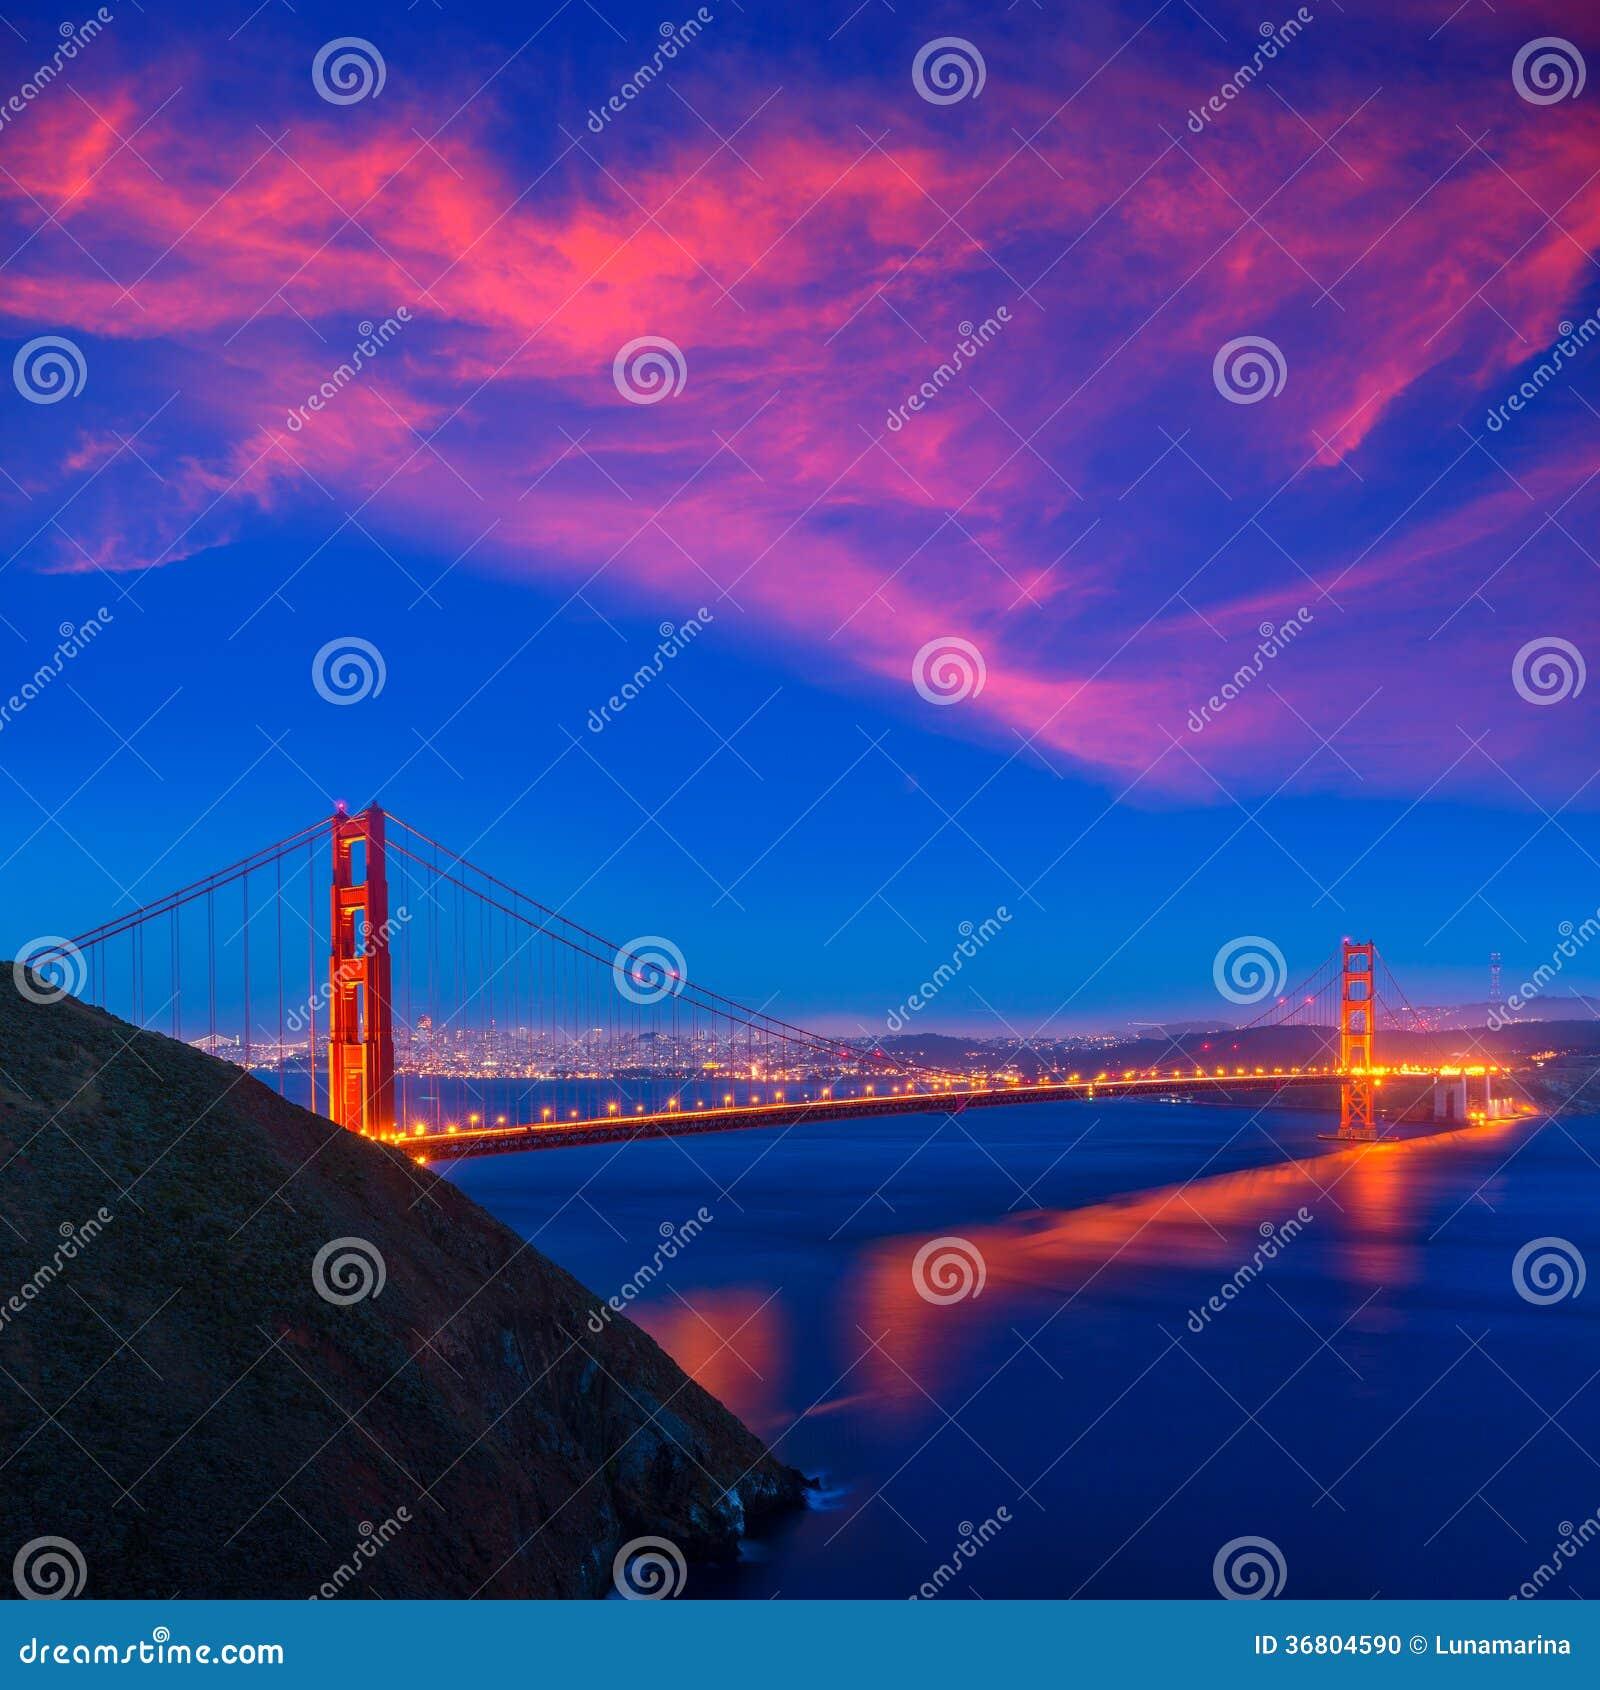 Golden Gate Bridge San Francisco California Sunset Picture